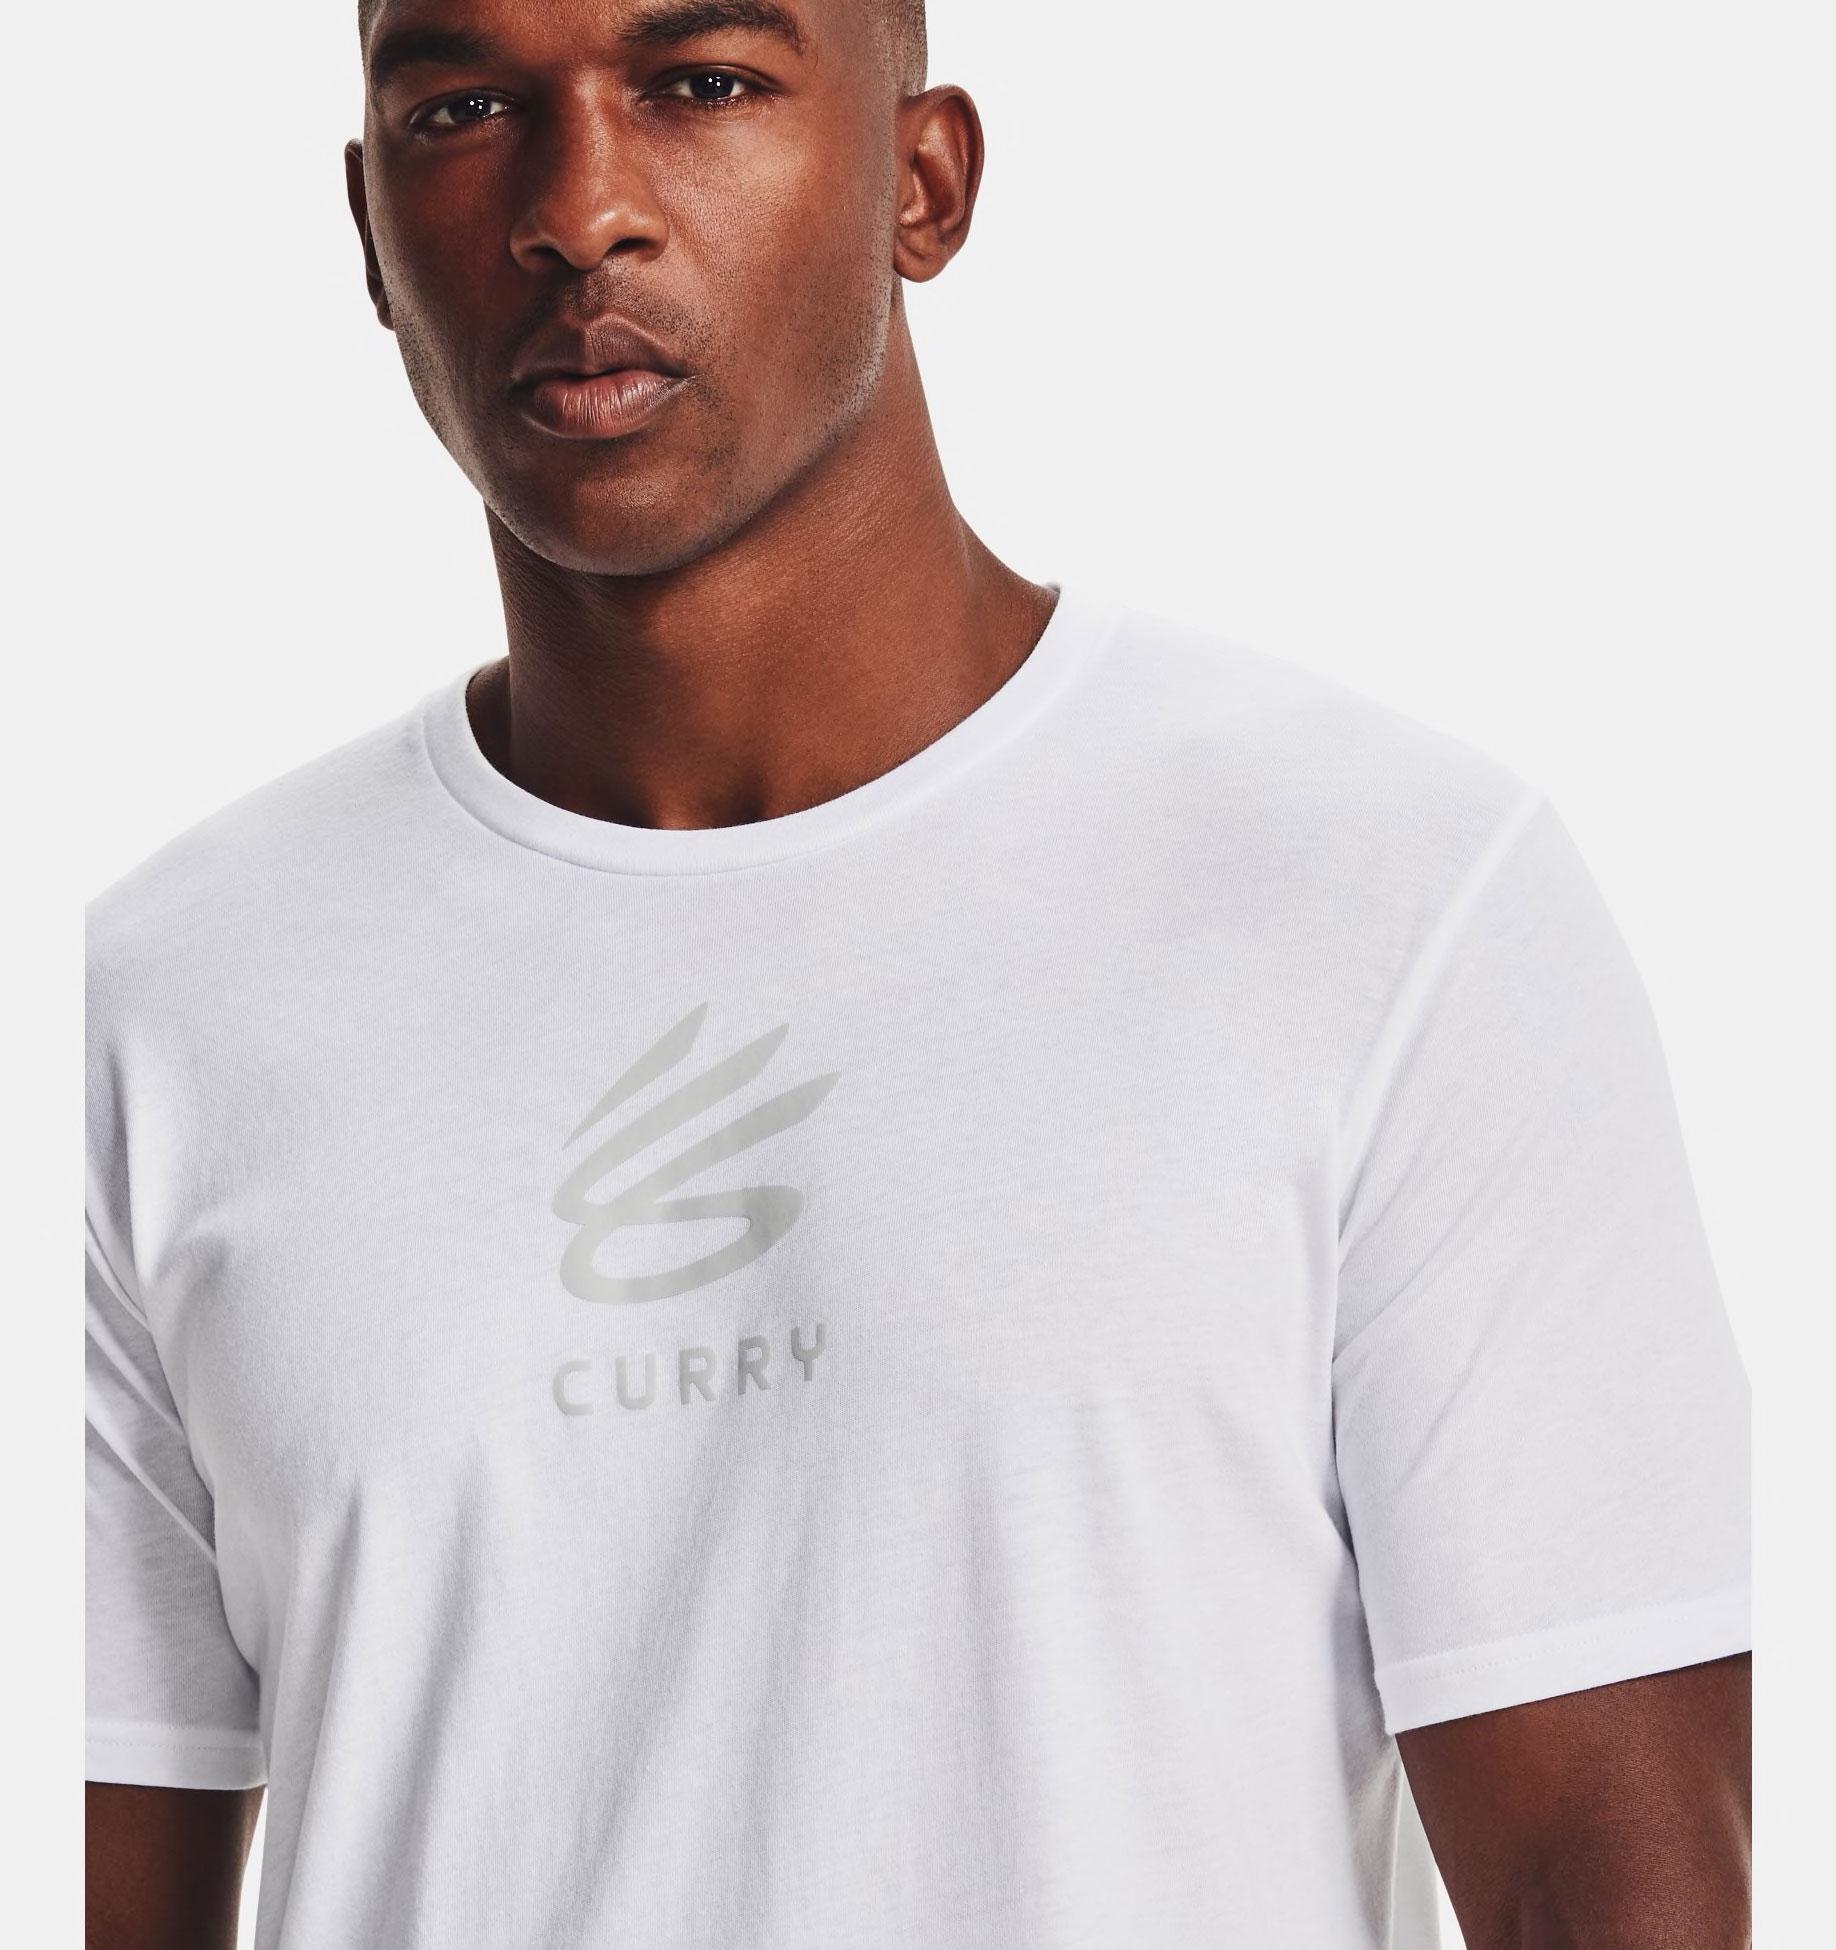 curry-8-white-shirt